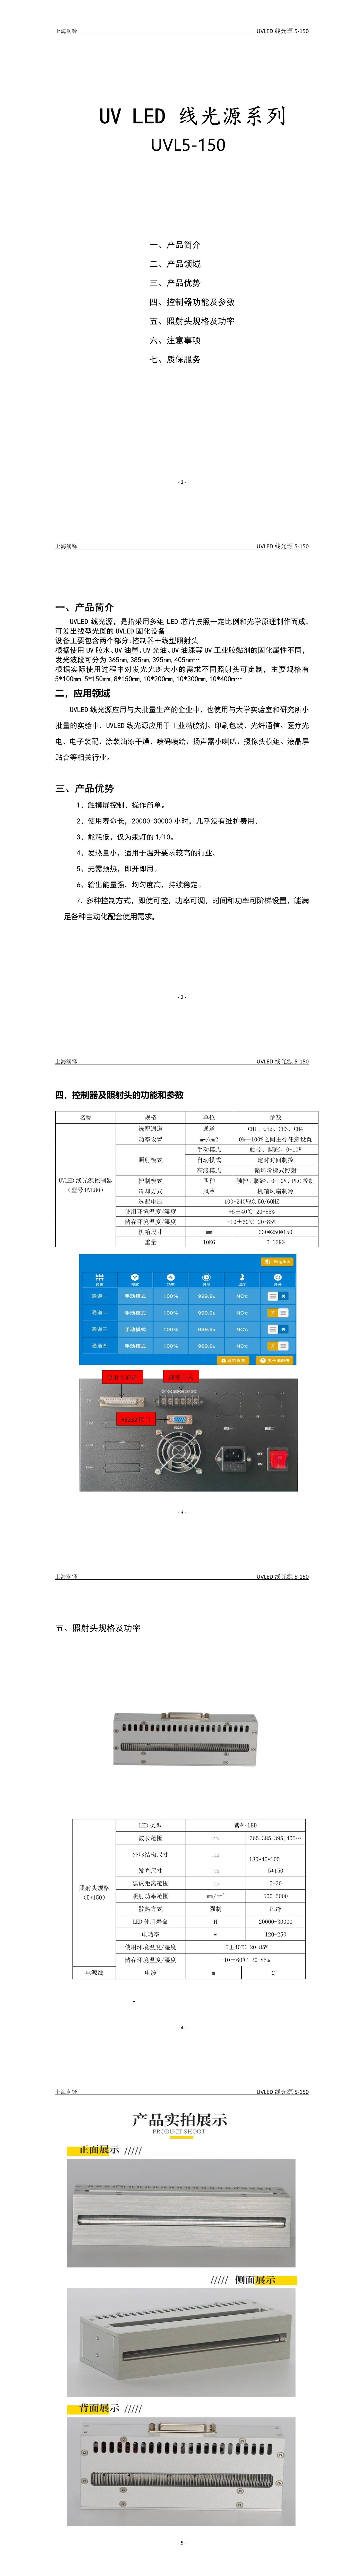 UVLED线光源UVL5-150